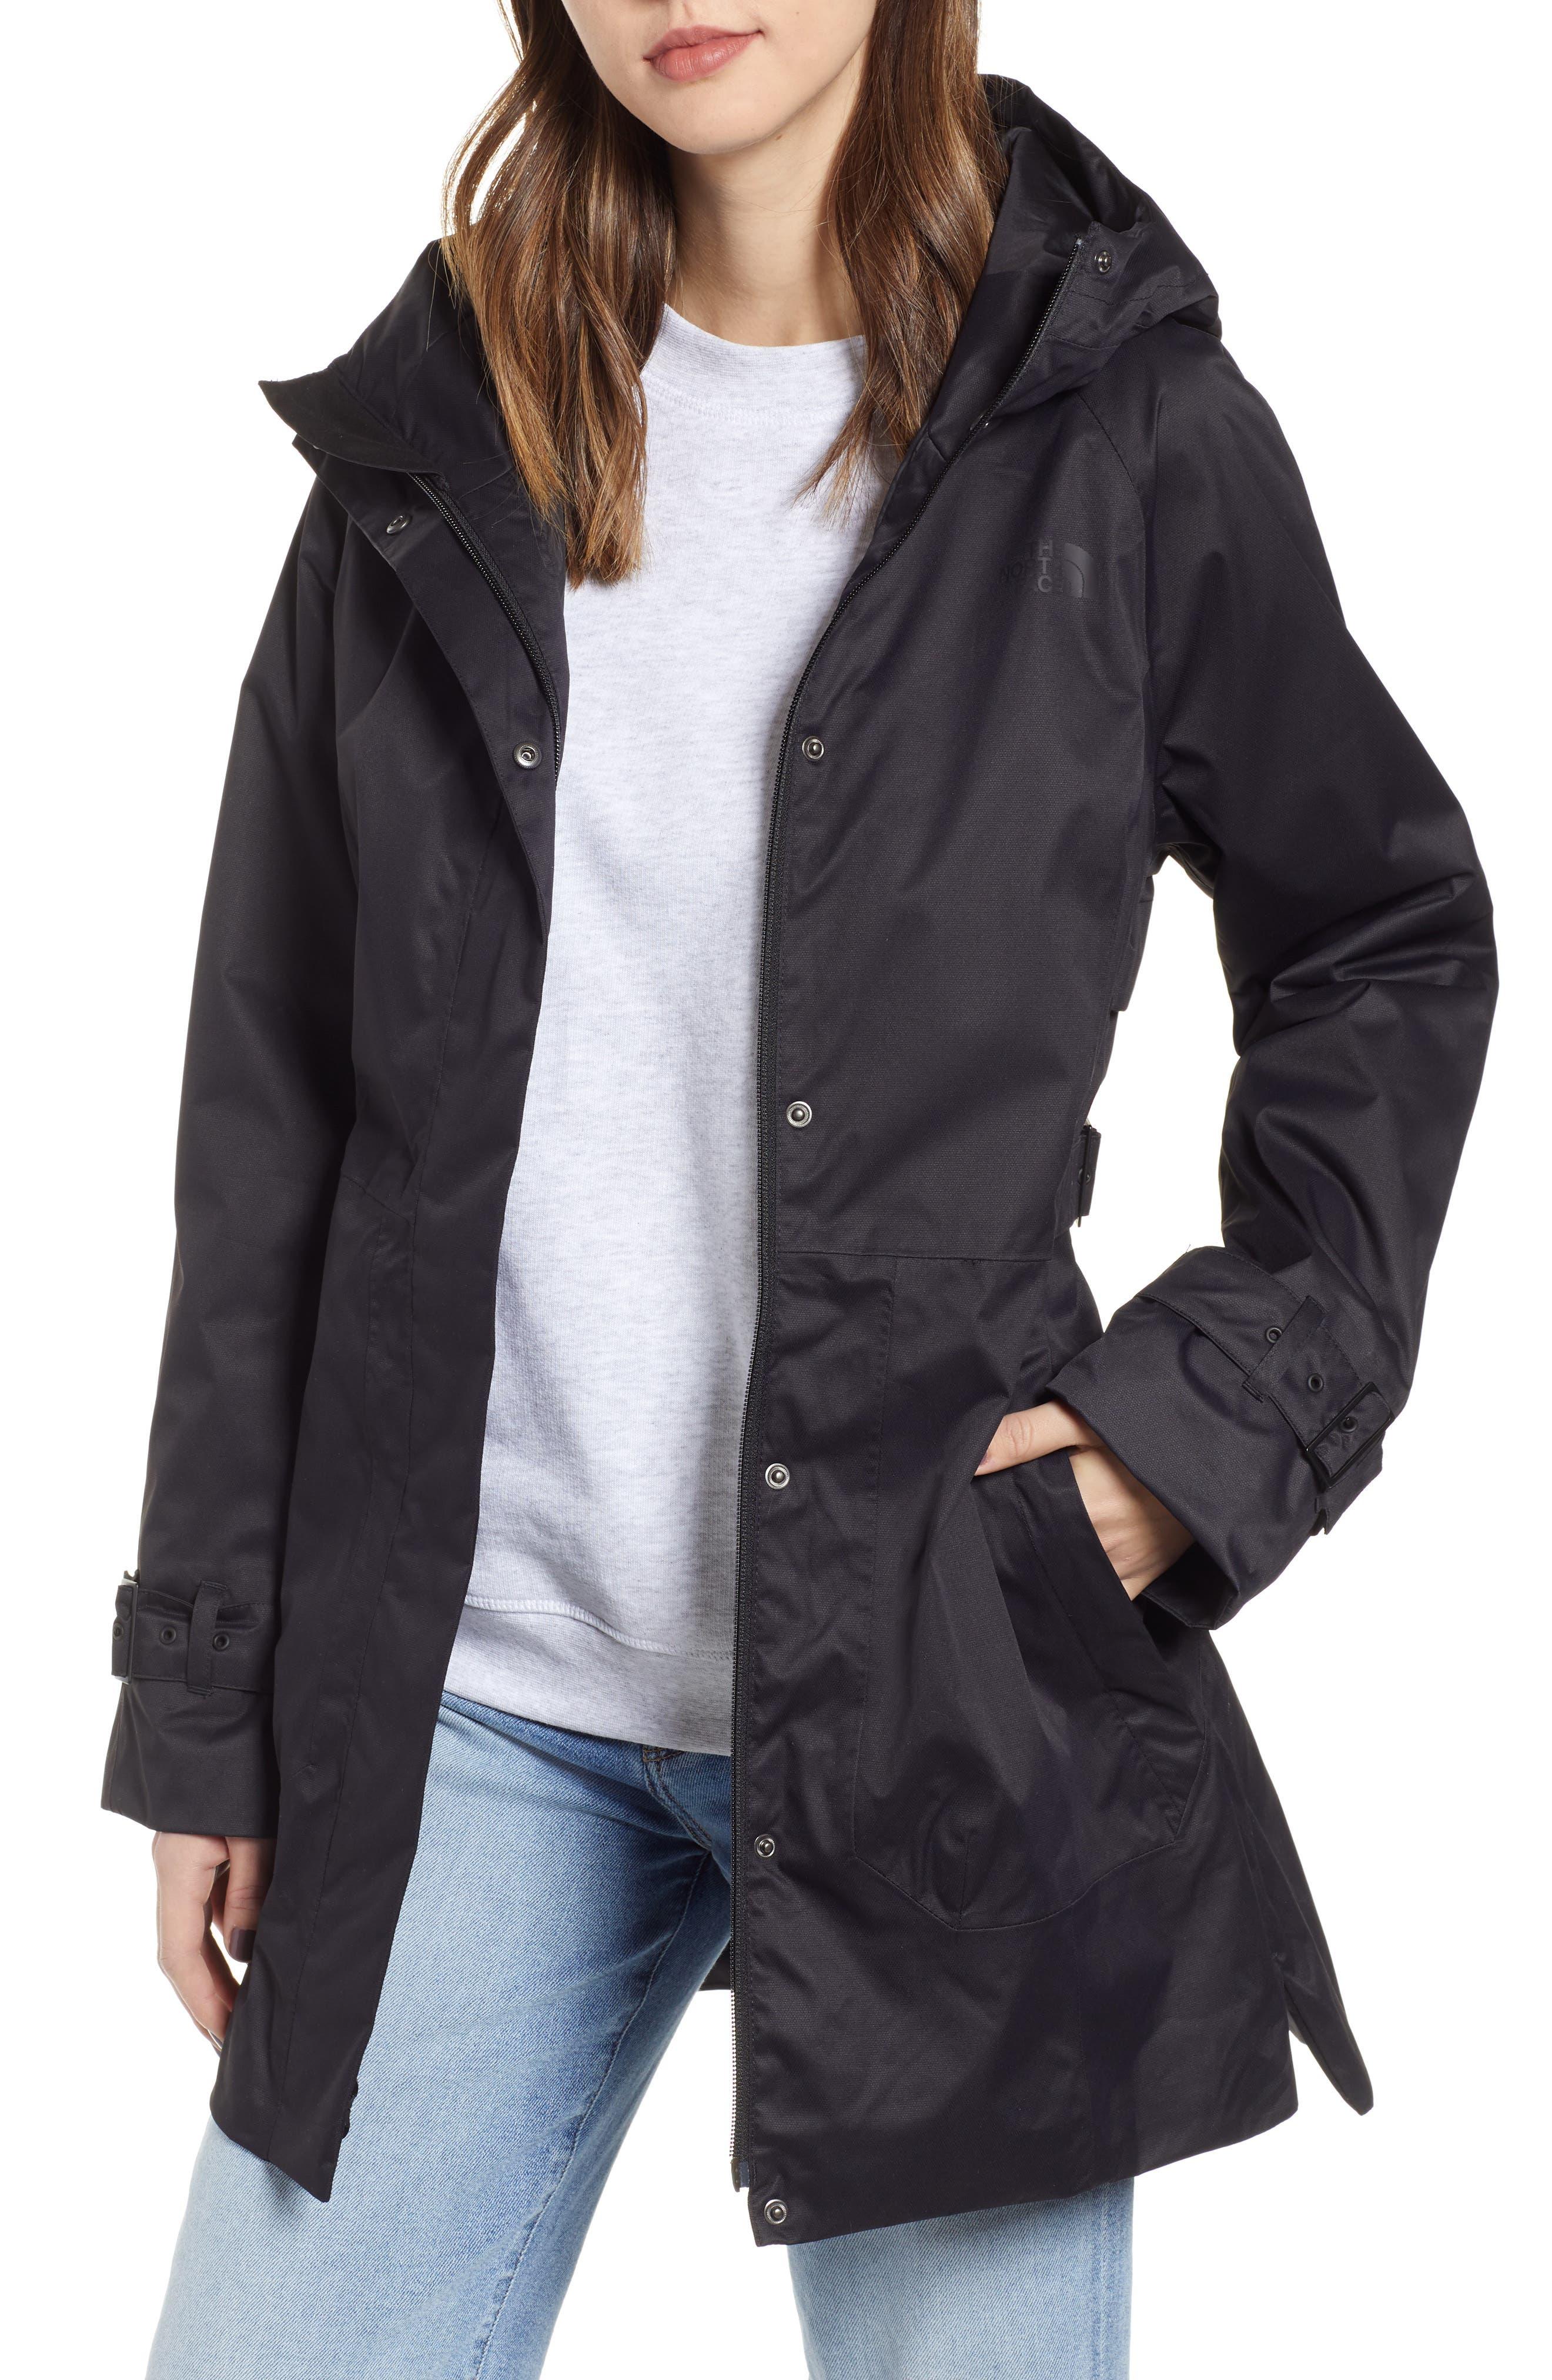 THE NORTH FACE, City Breeze Trench Raincoat, Main thumbnail 1, color, TNF BLACK